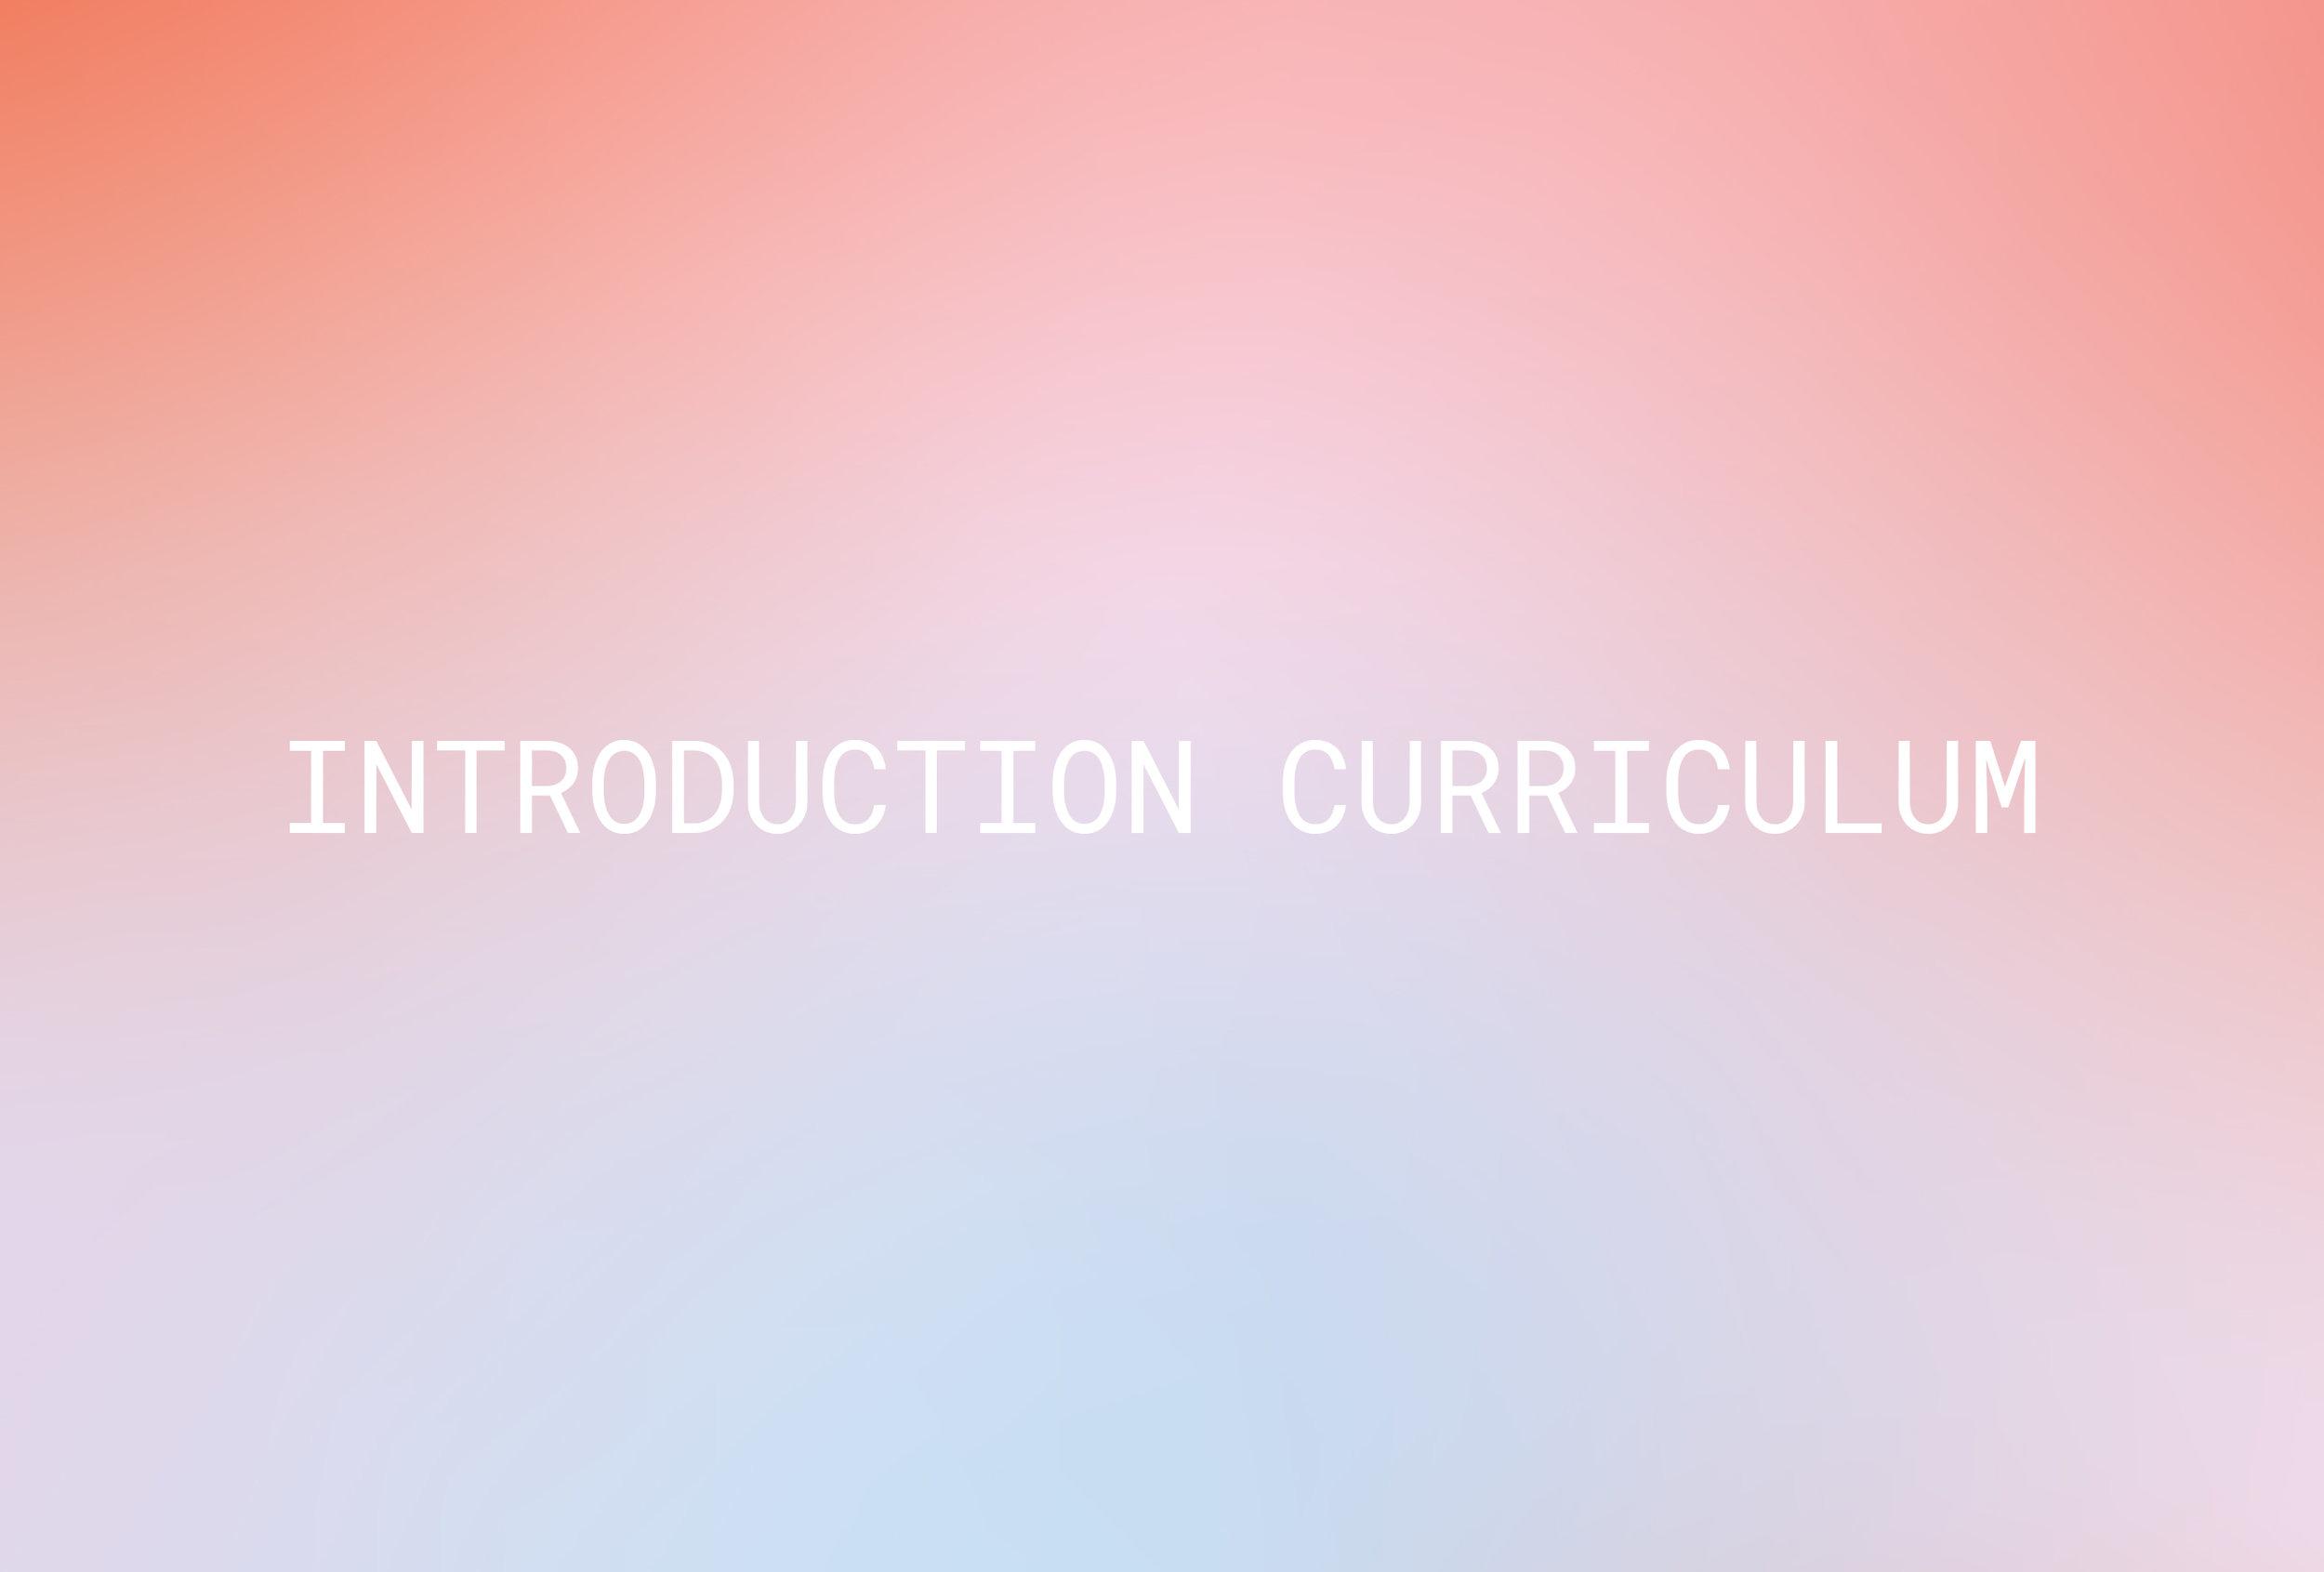 INTRO_CURRICULUM_HEADER.jpg